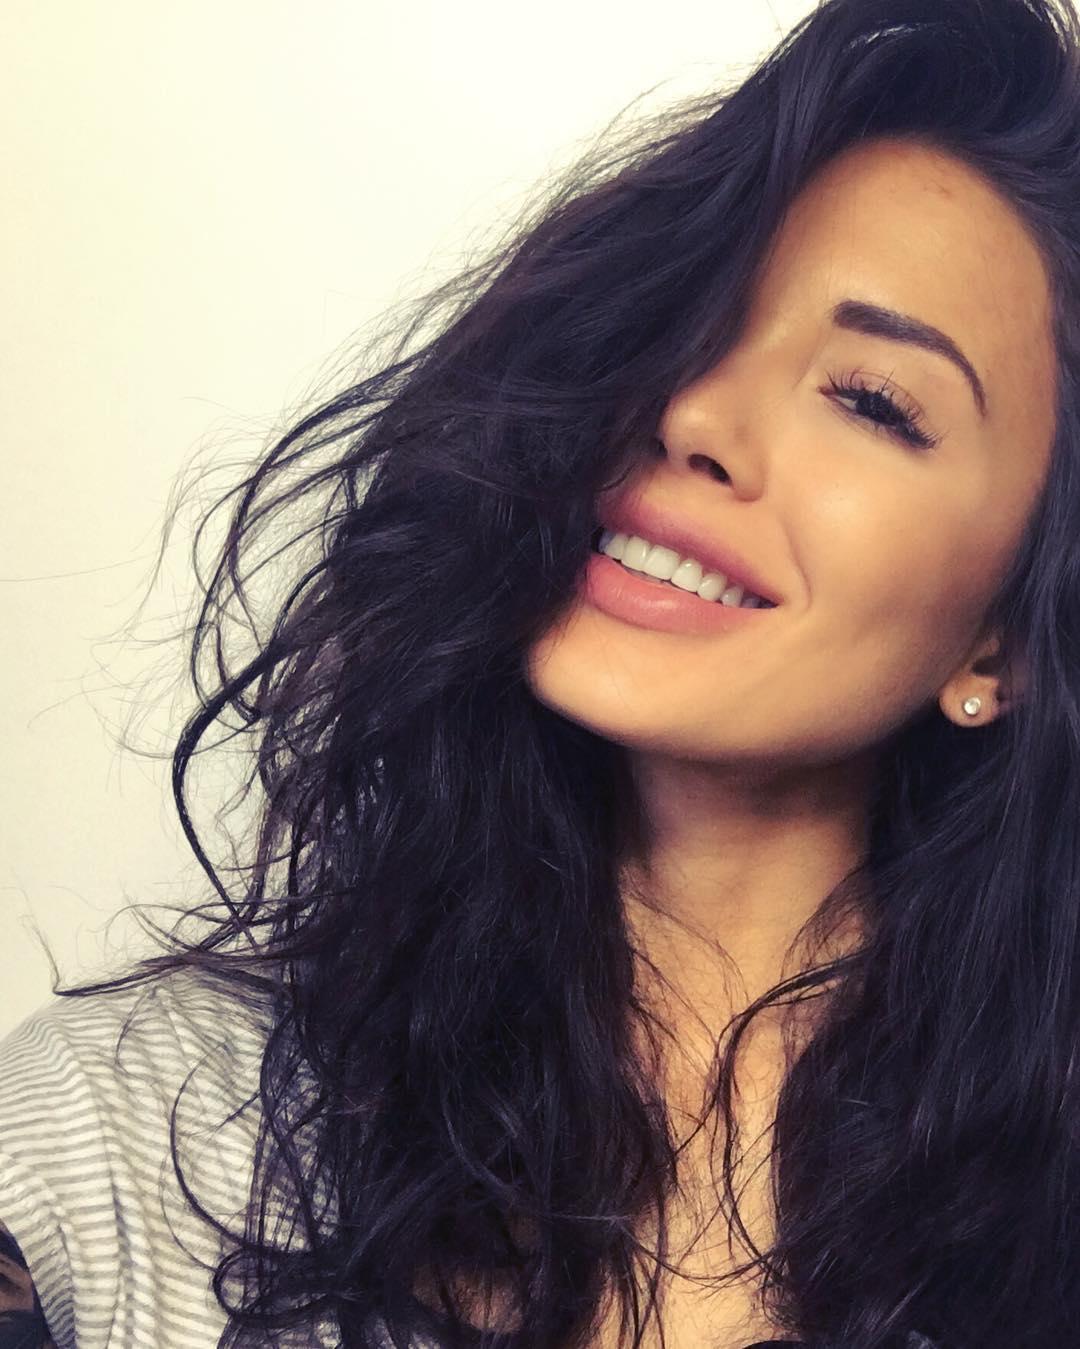 Nathalia Ashba